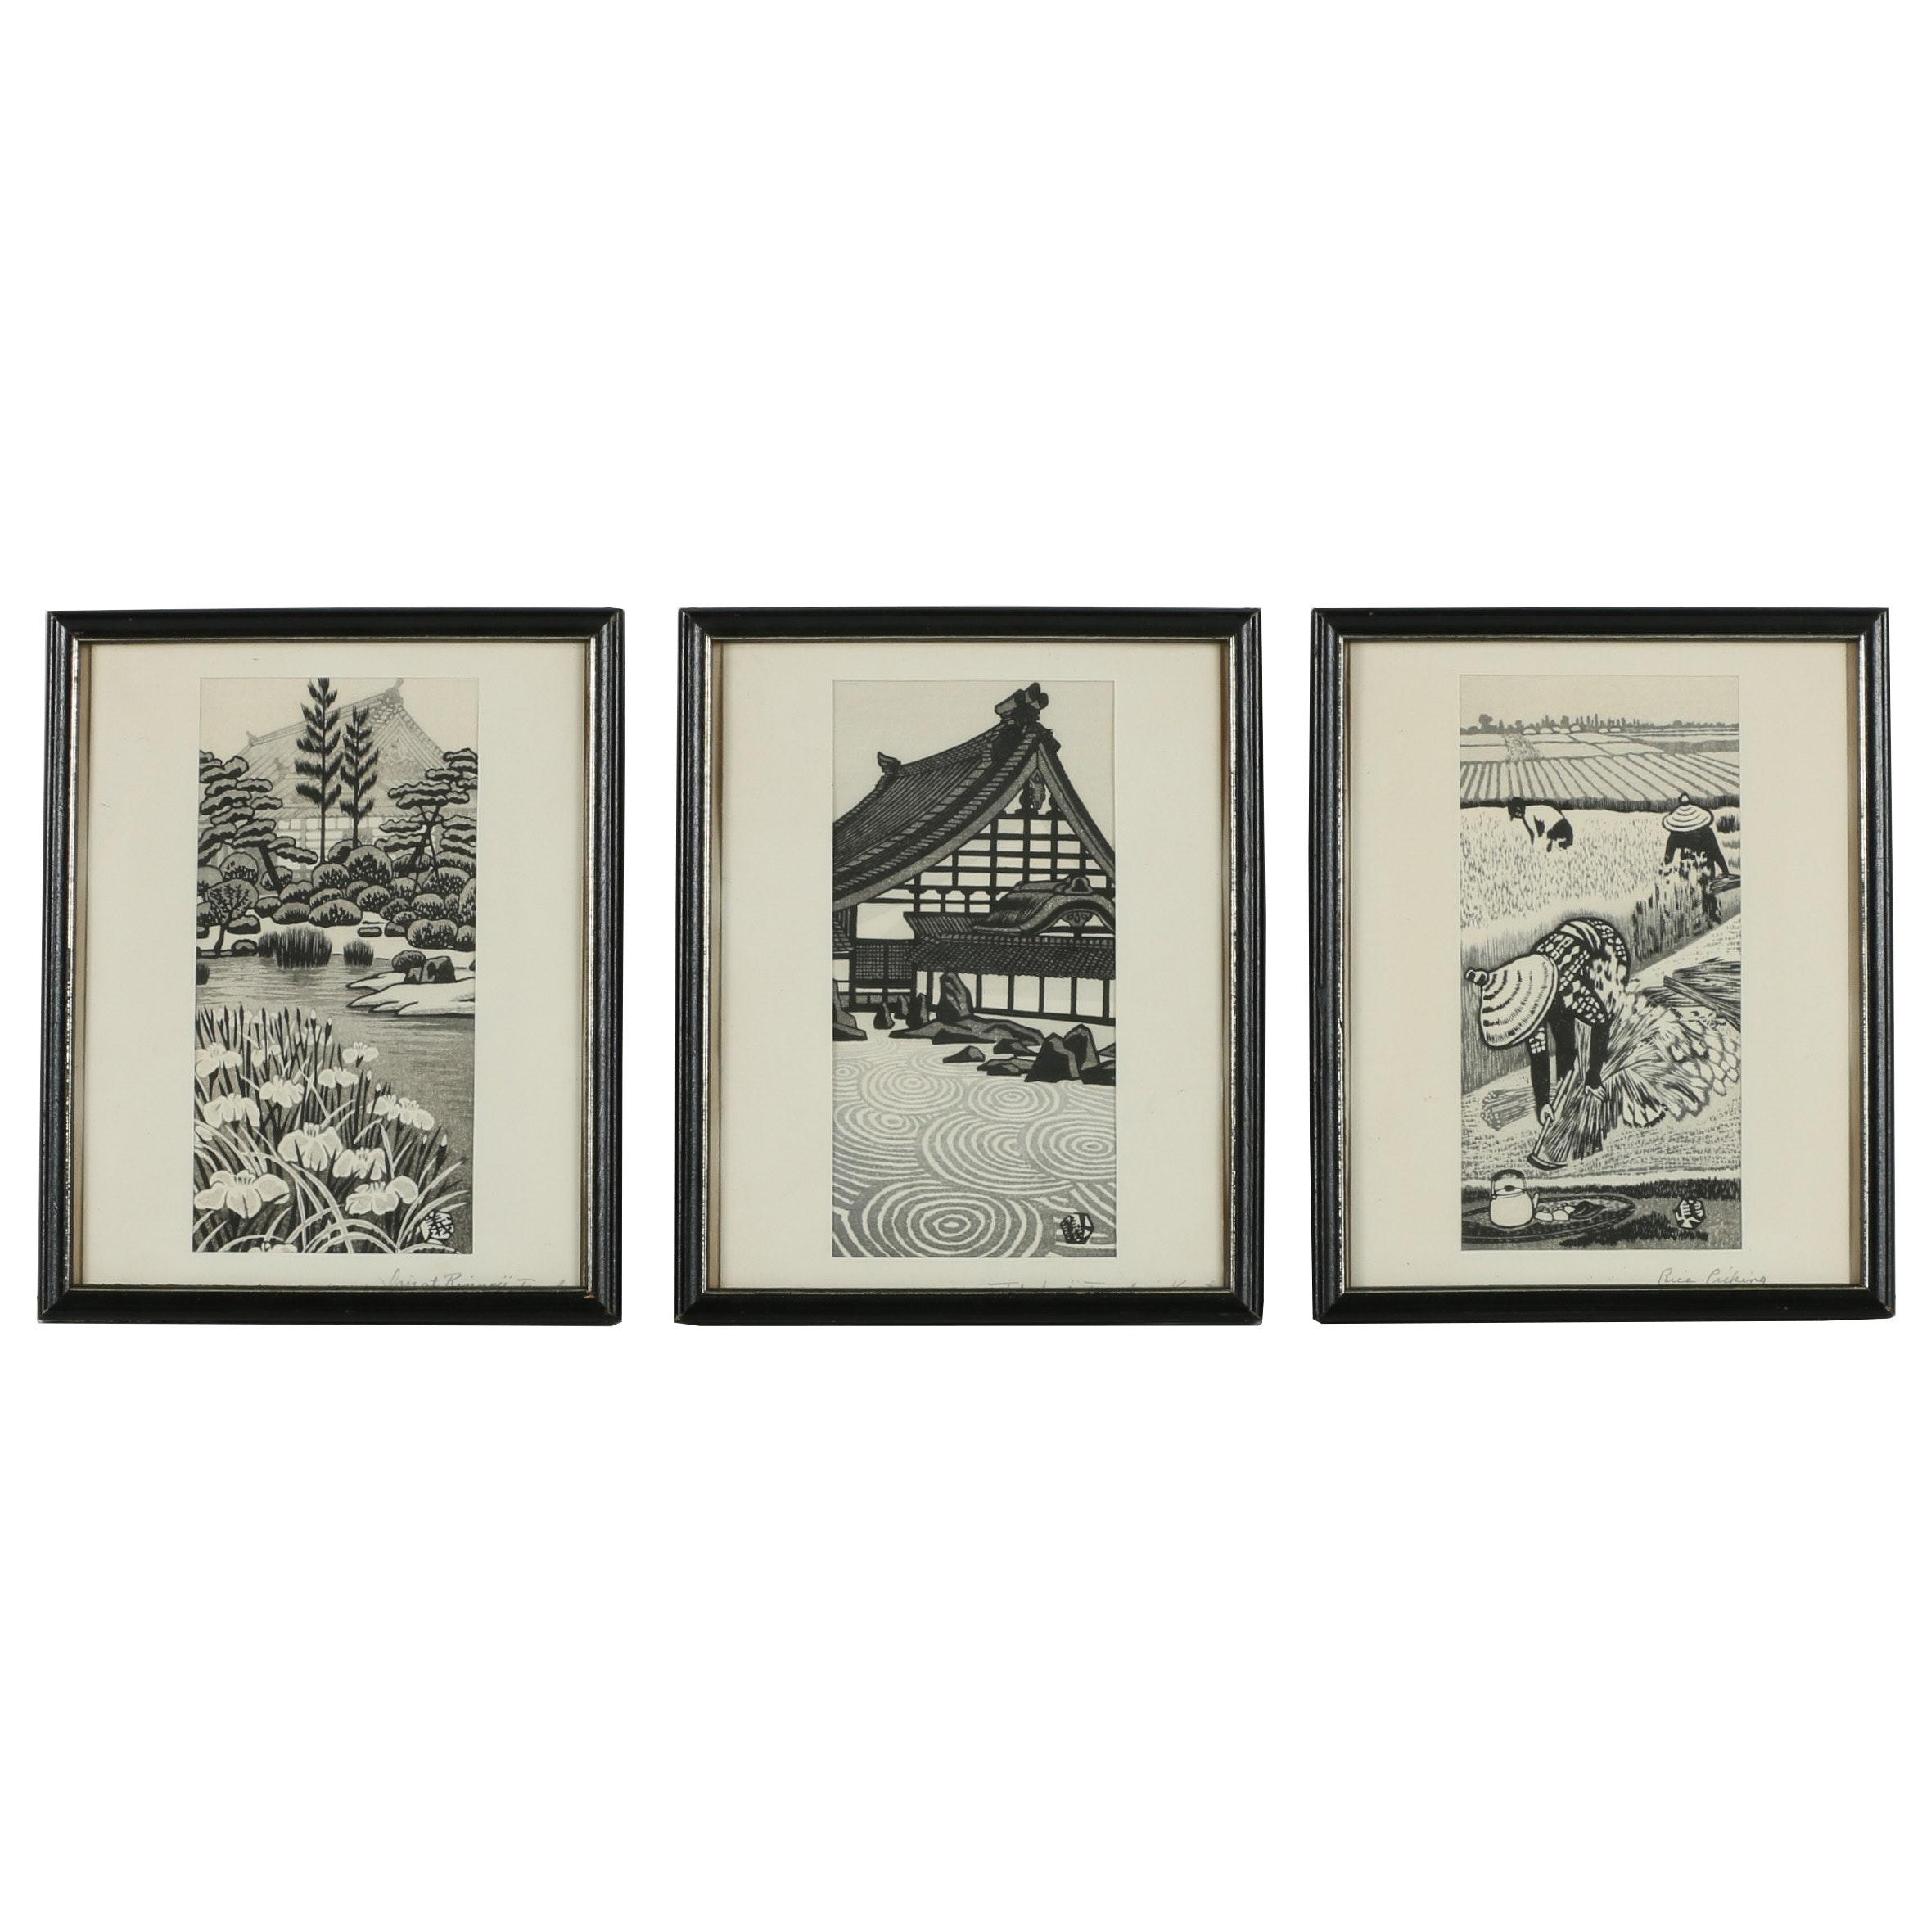 Gihachiro Okuyama Woodblocks